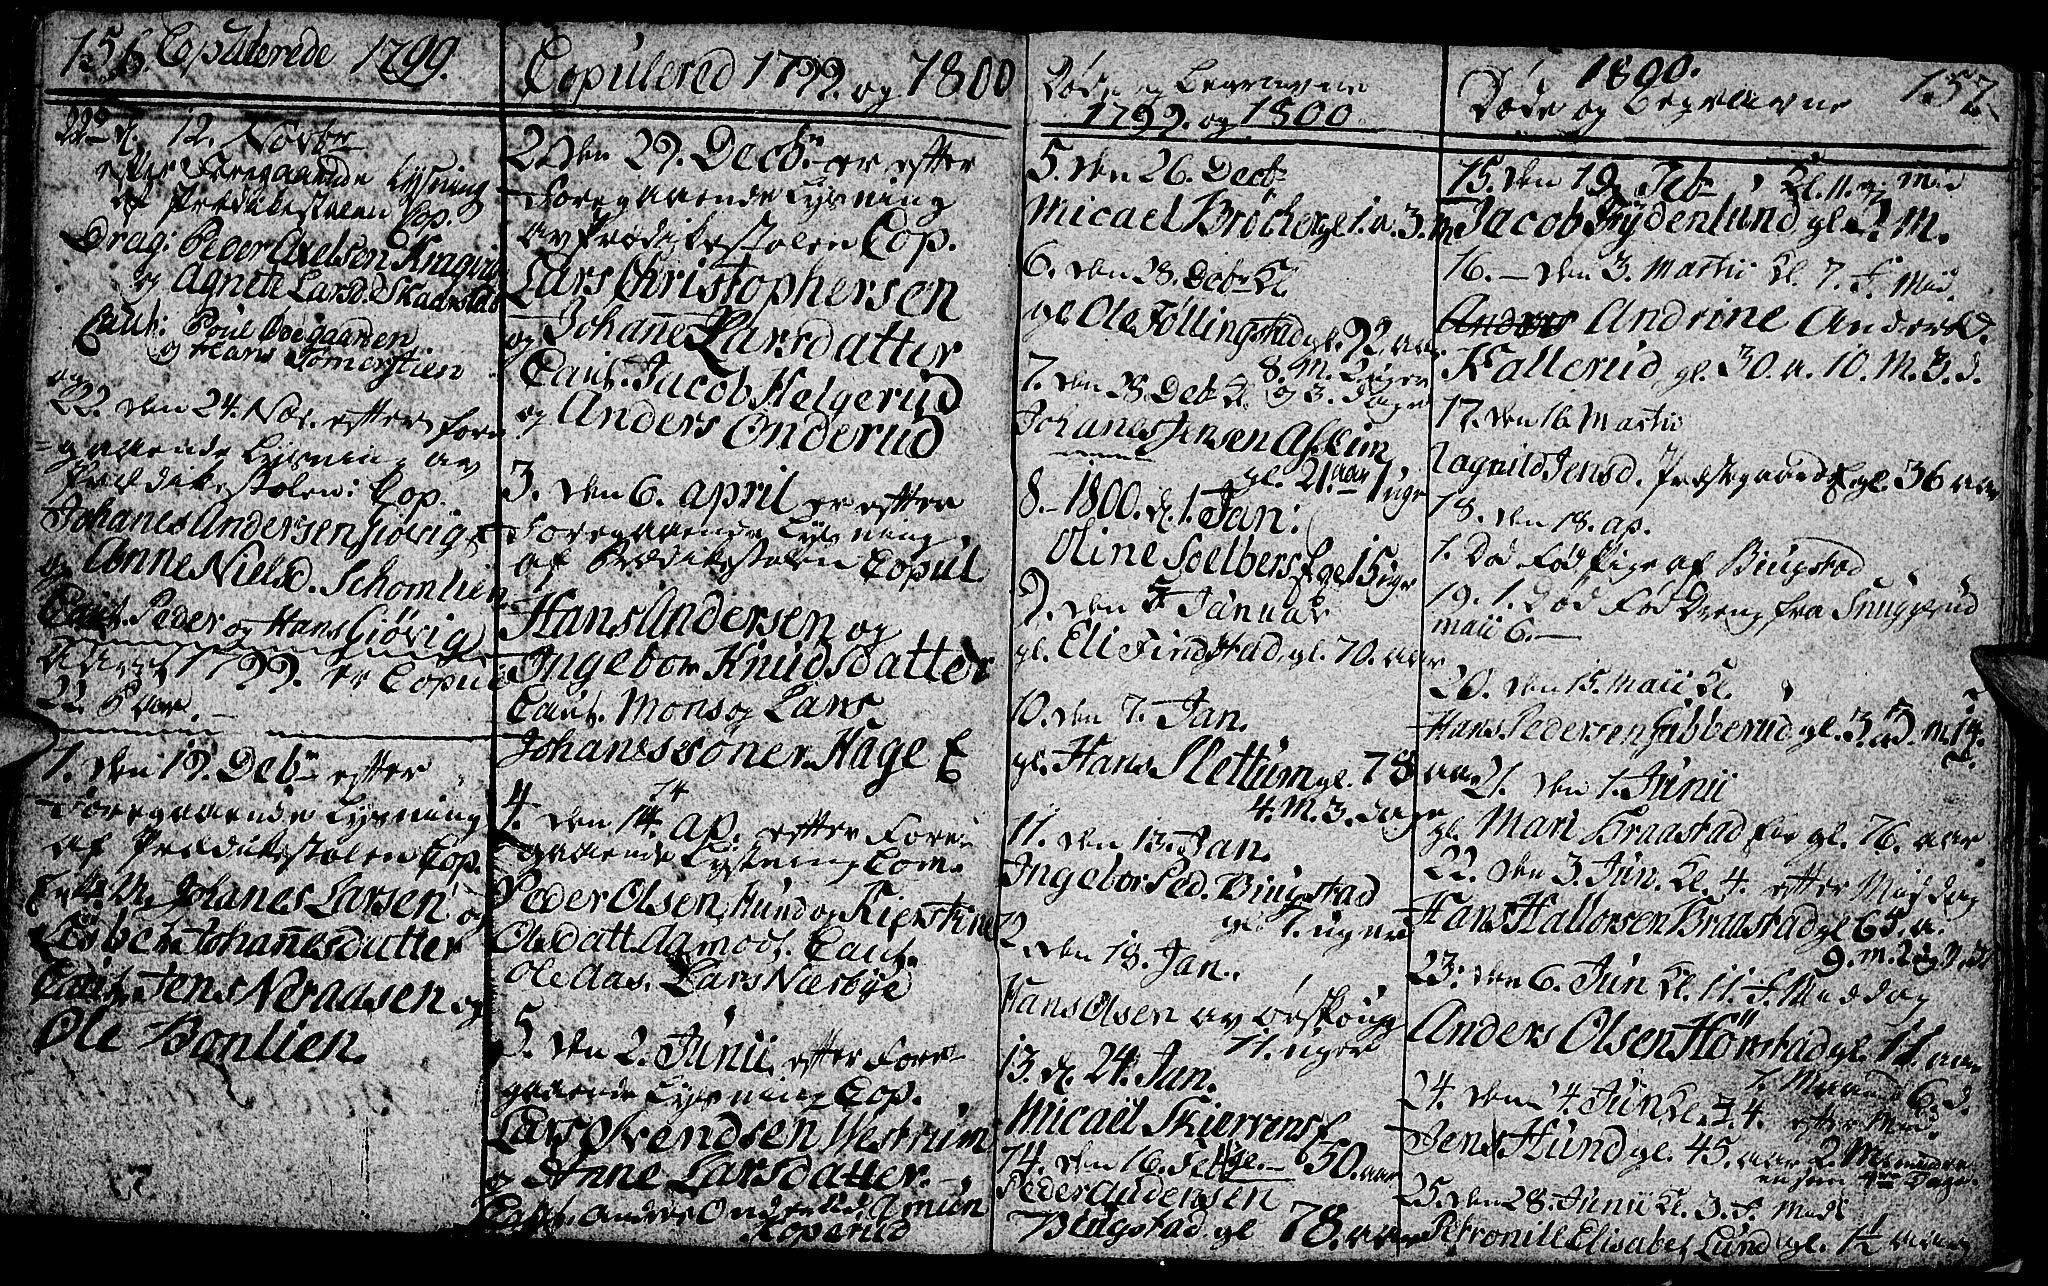 SAH, Vardal prestekontor, H/Ha/Hab/L0002: Klokkerbok nr. 2, 1790-1803, s. 156-157